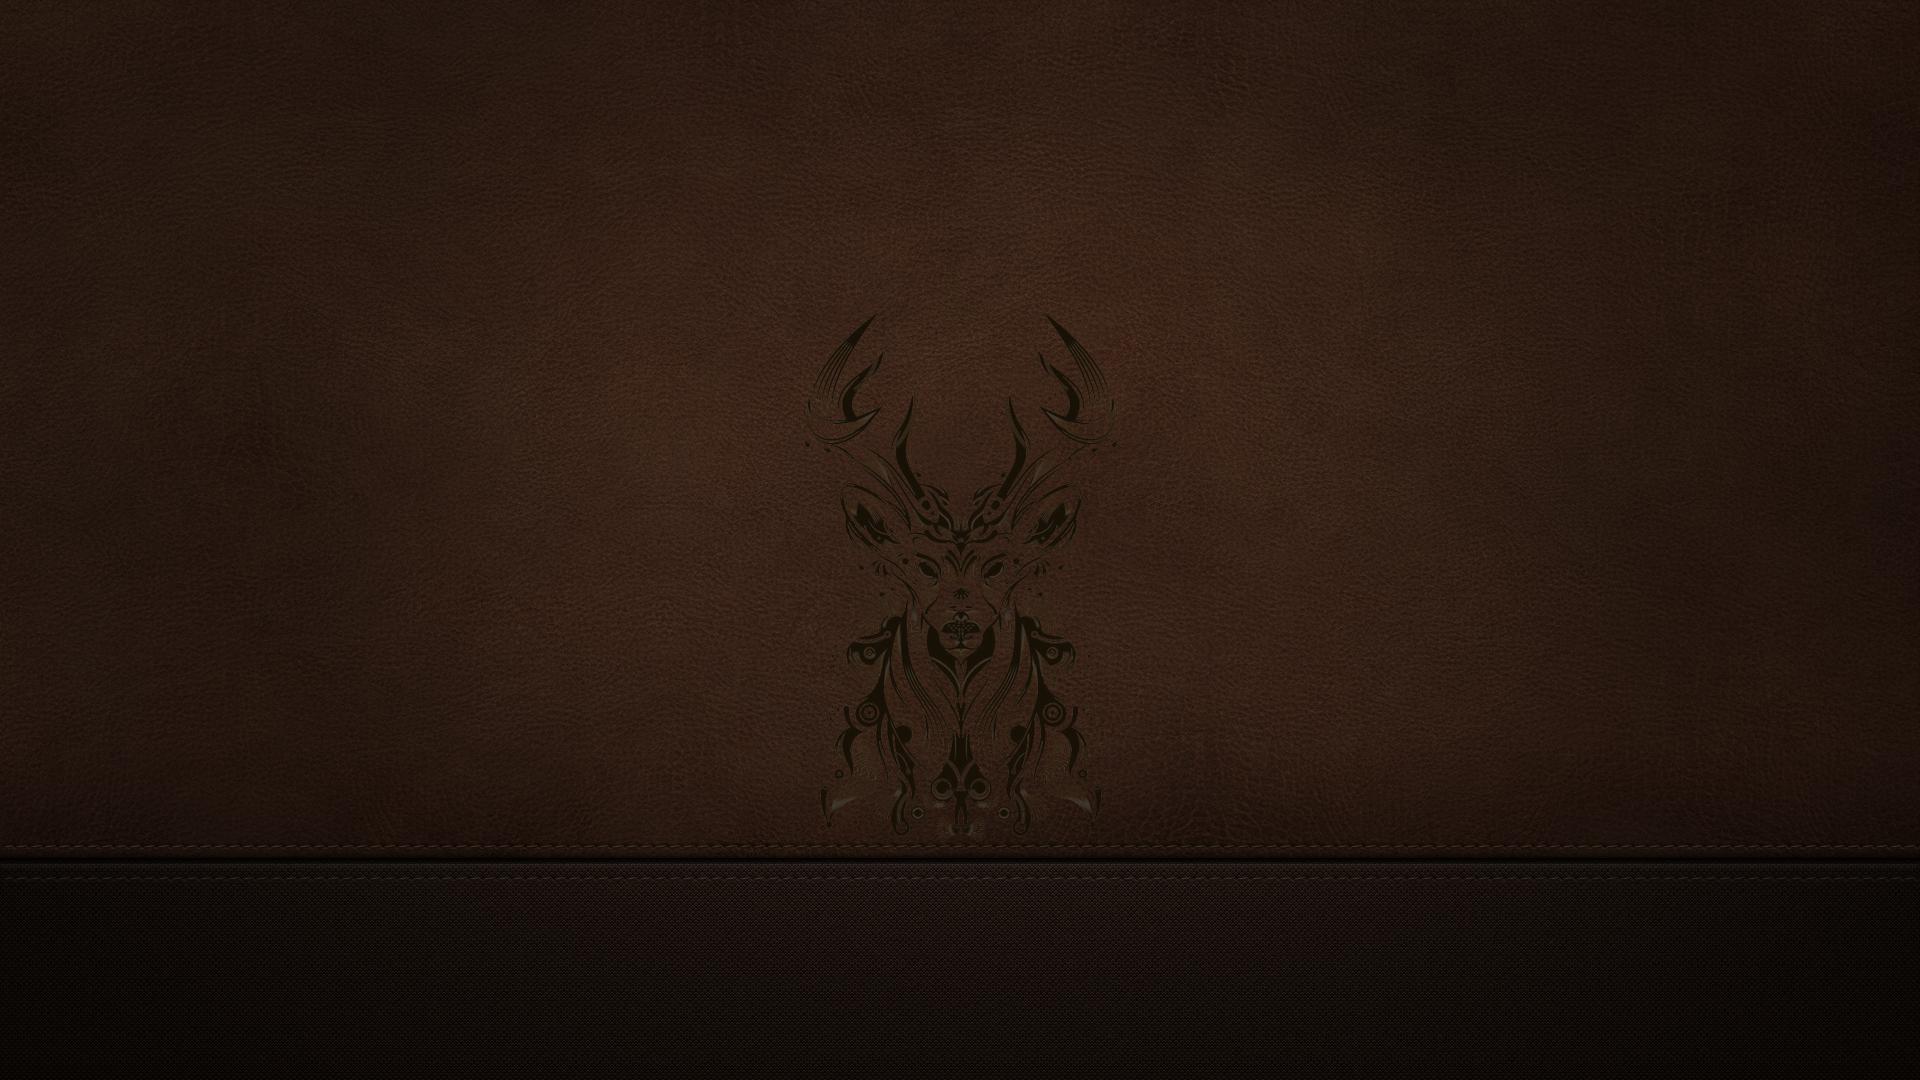 jagermeister wallpaper desktop - photo #6